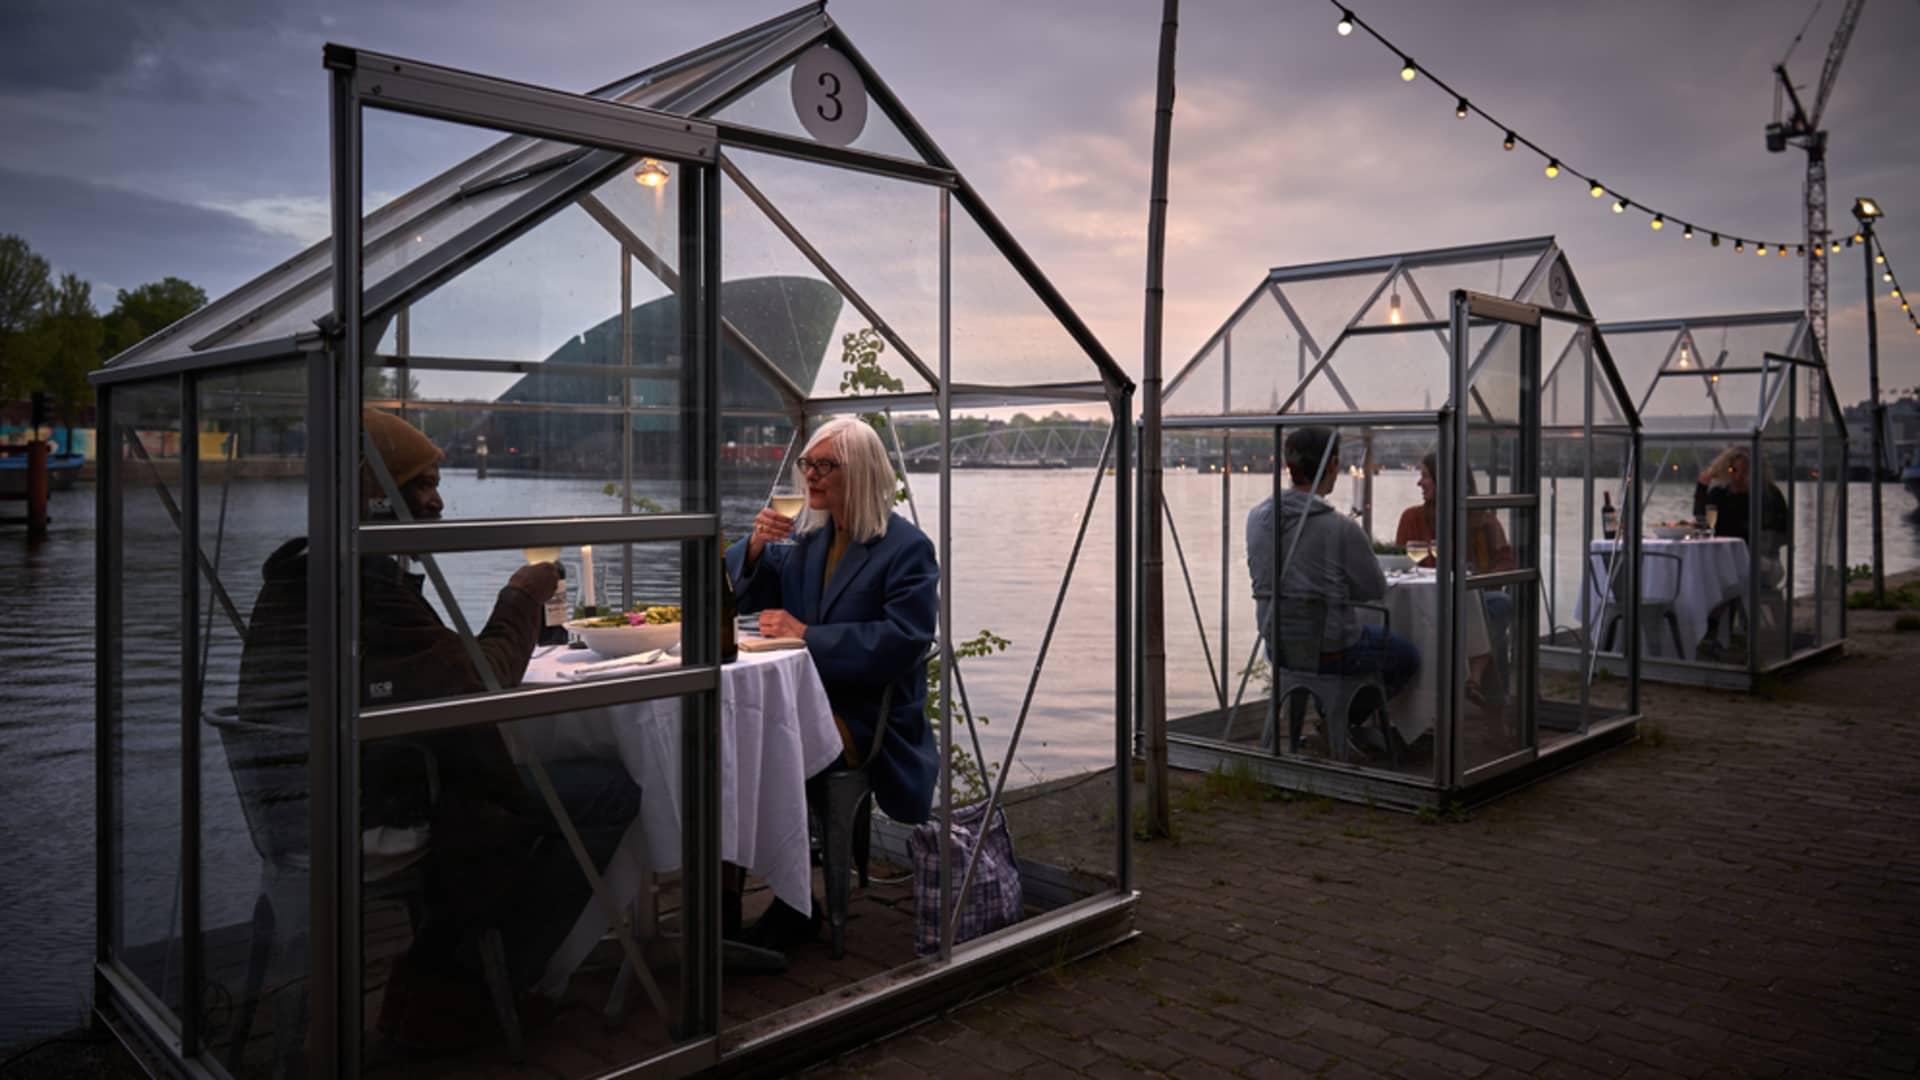 Diners inside Mediamatic ETEN's greenhouses.